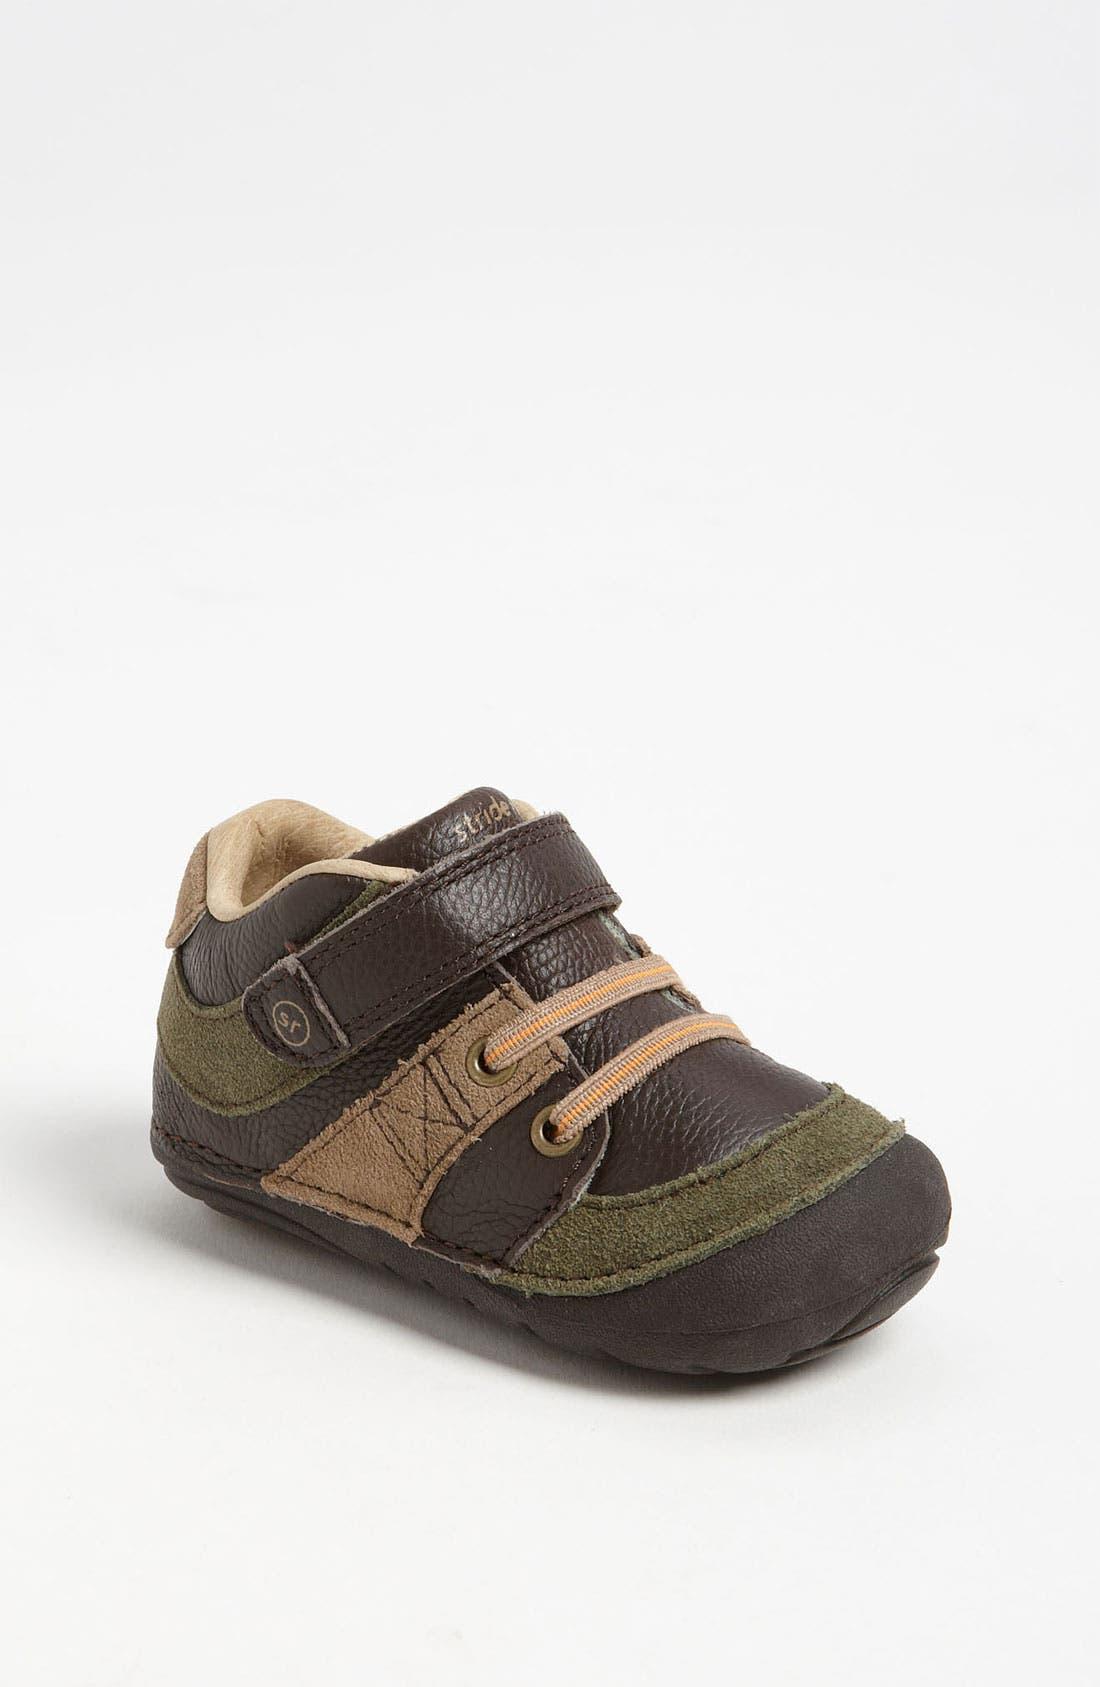 Alternate Image 1 Selected - Stride Rite 'Julien' Sneaker (Baby & Walker)